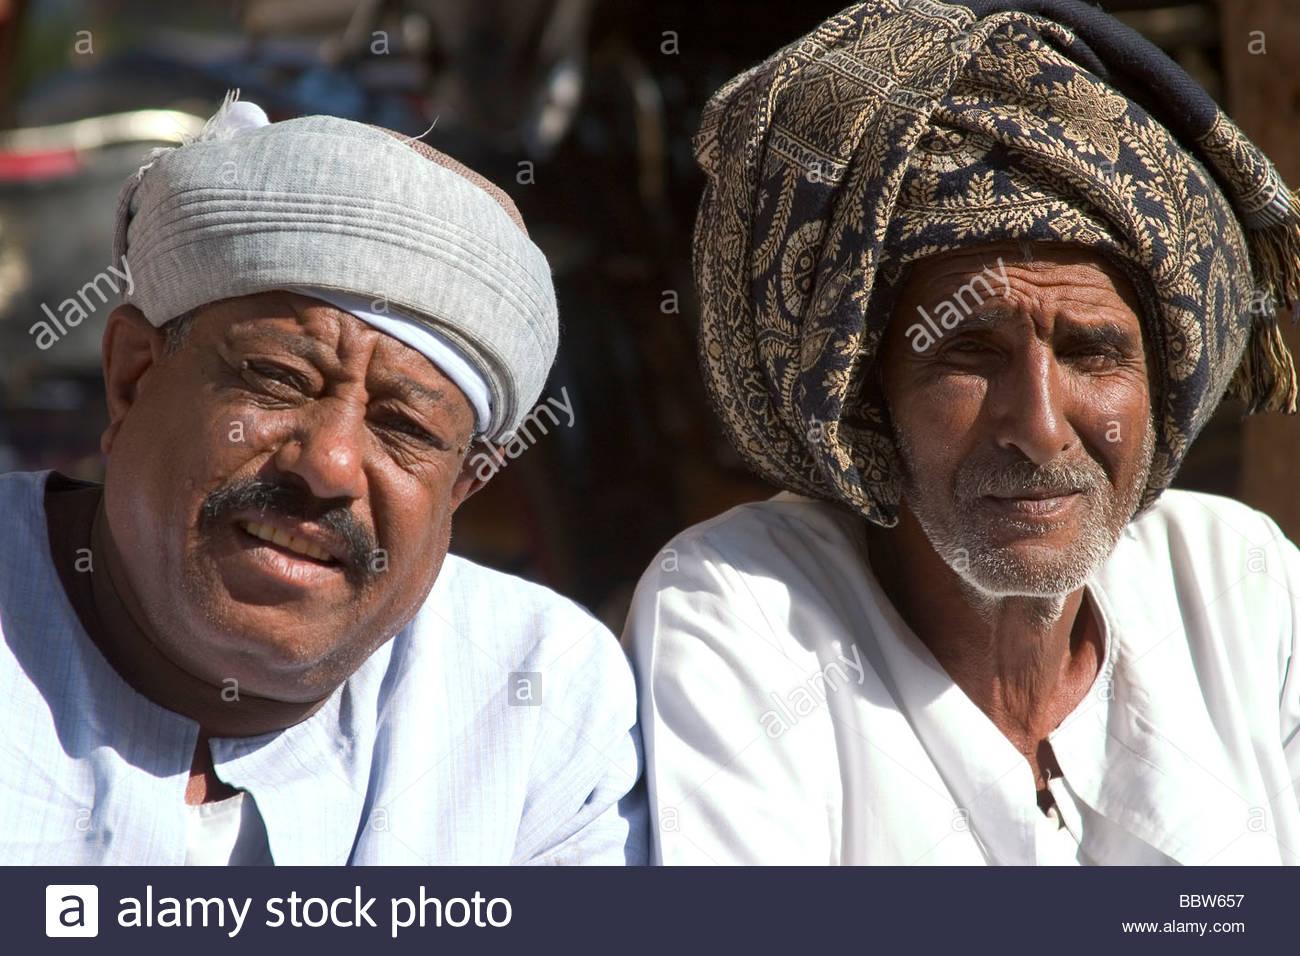 Mature egyptian bbw